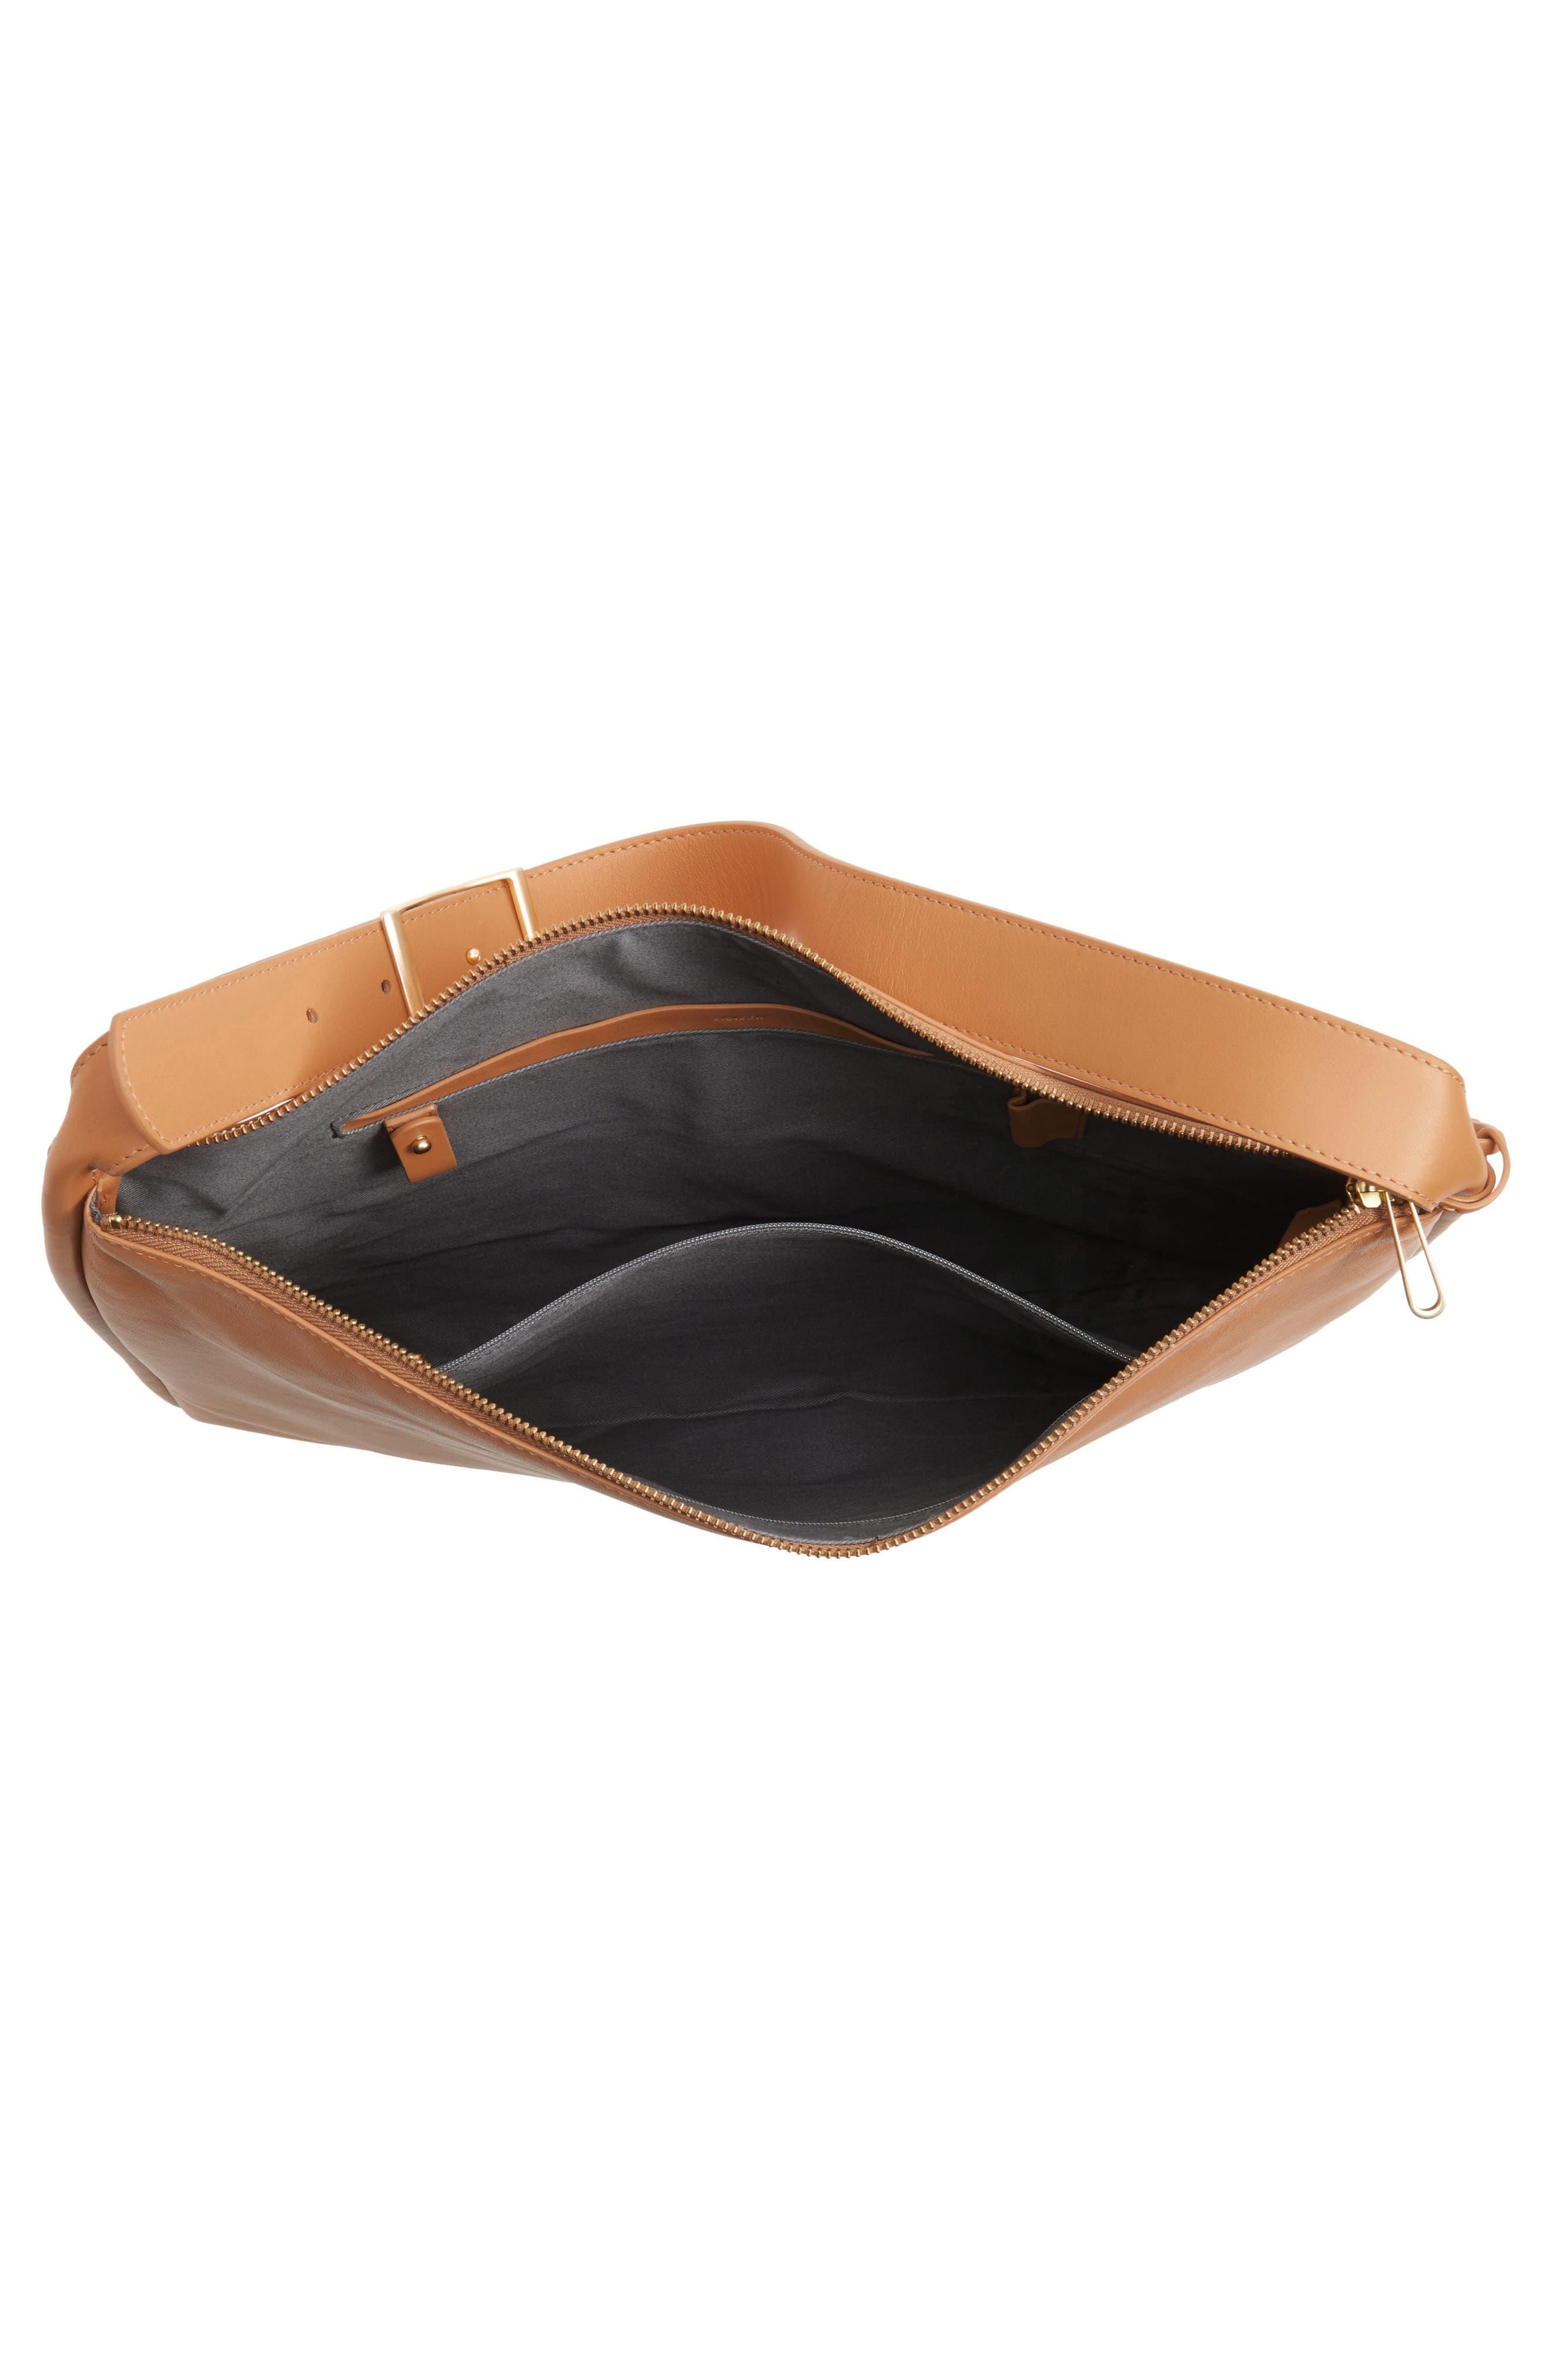 Anesa Leather Shoulder Bag,                             Alternate thumbnail 4, color,                             Tan